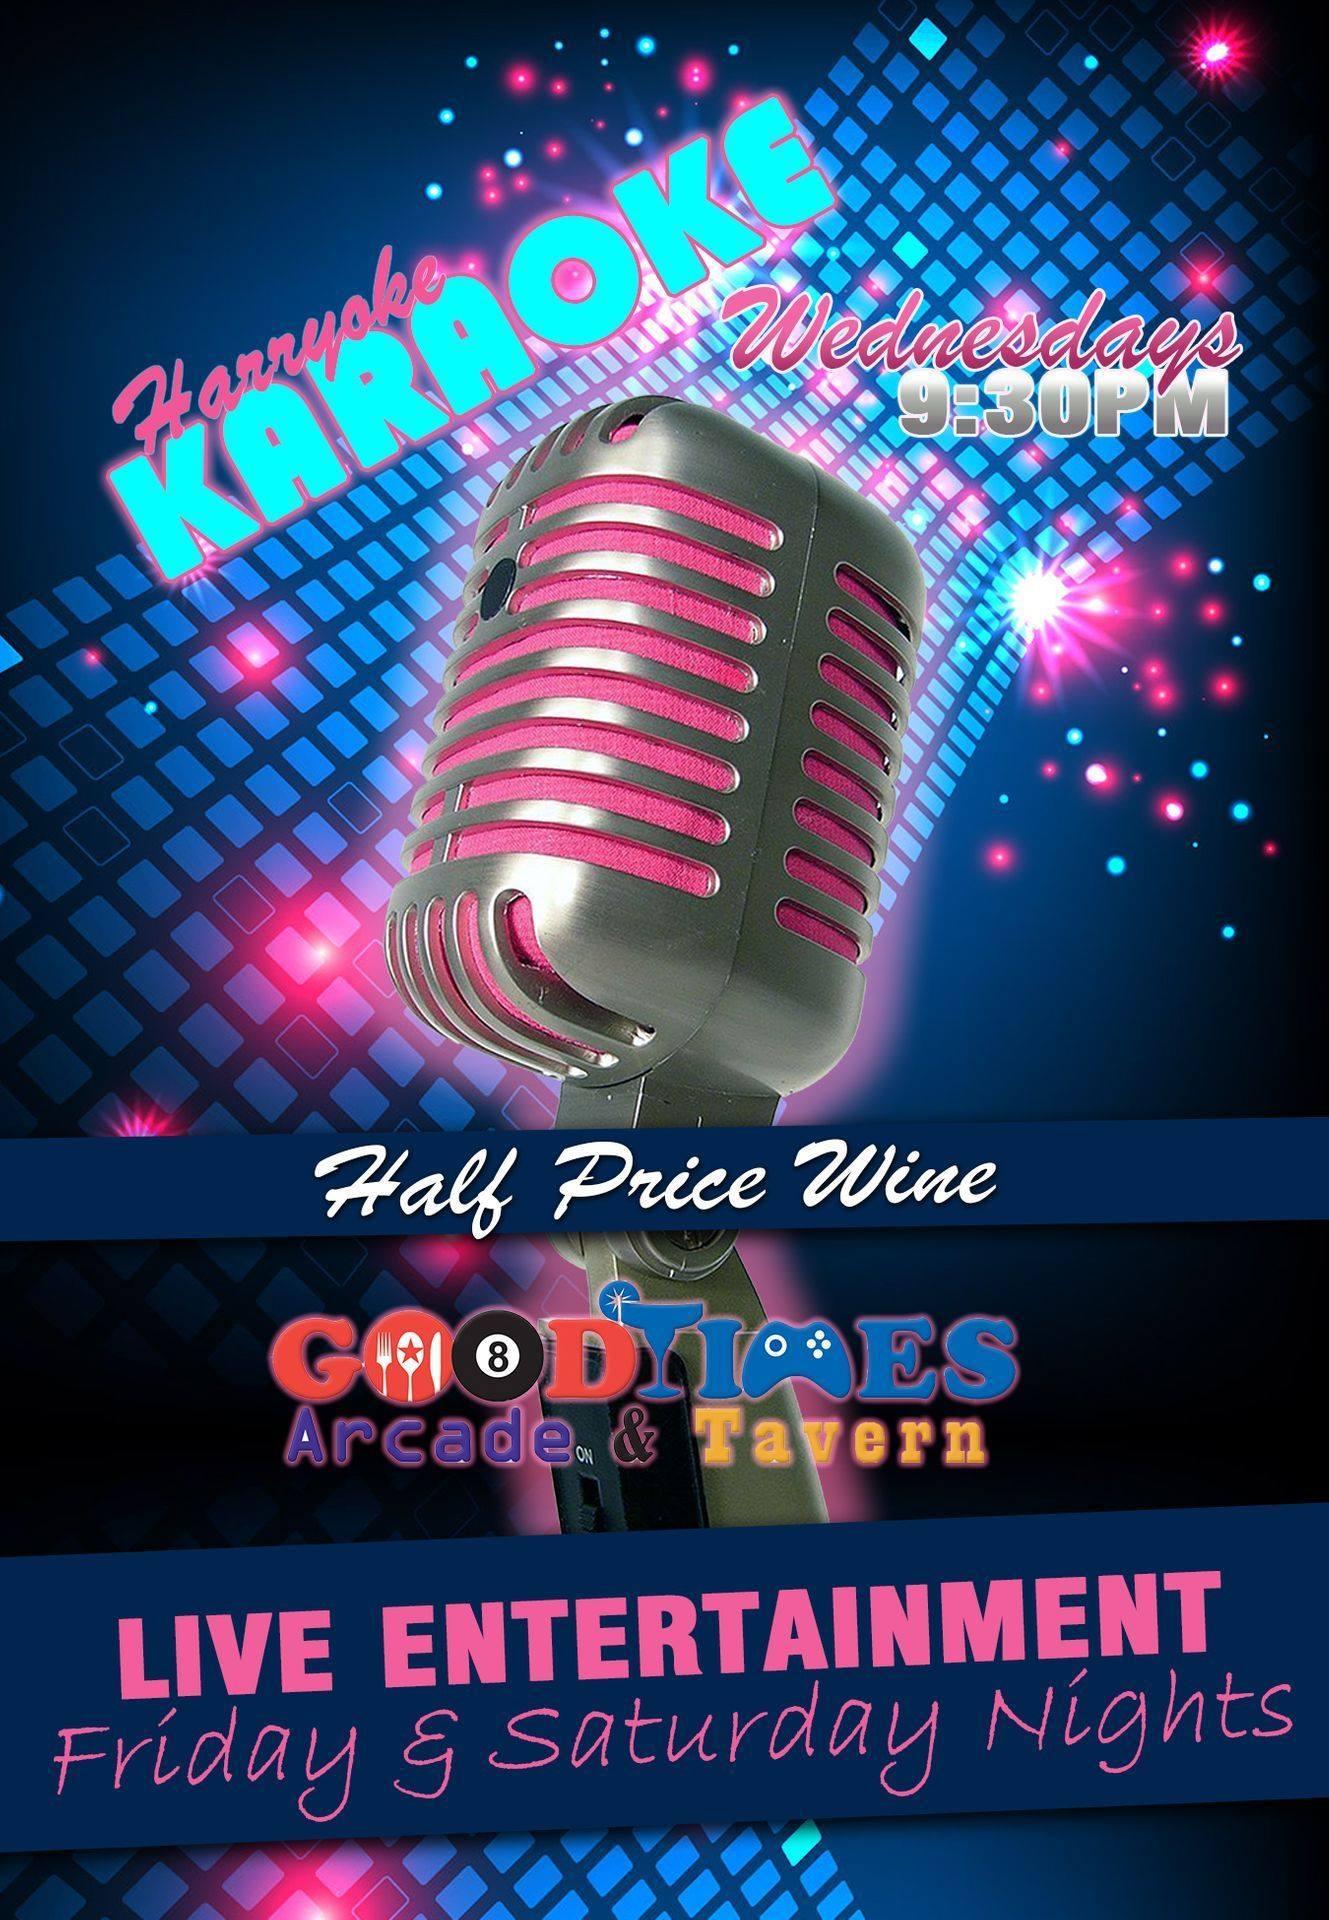 Good Times Arcade and Tavern 74 Son-Lan Pkwy #108, Garner